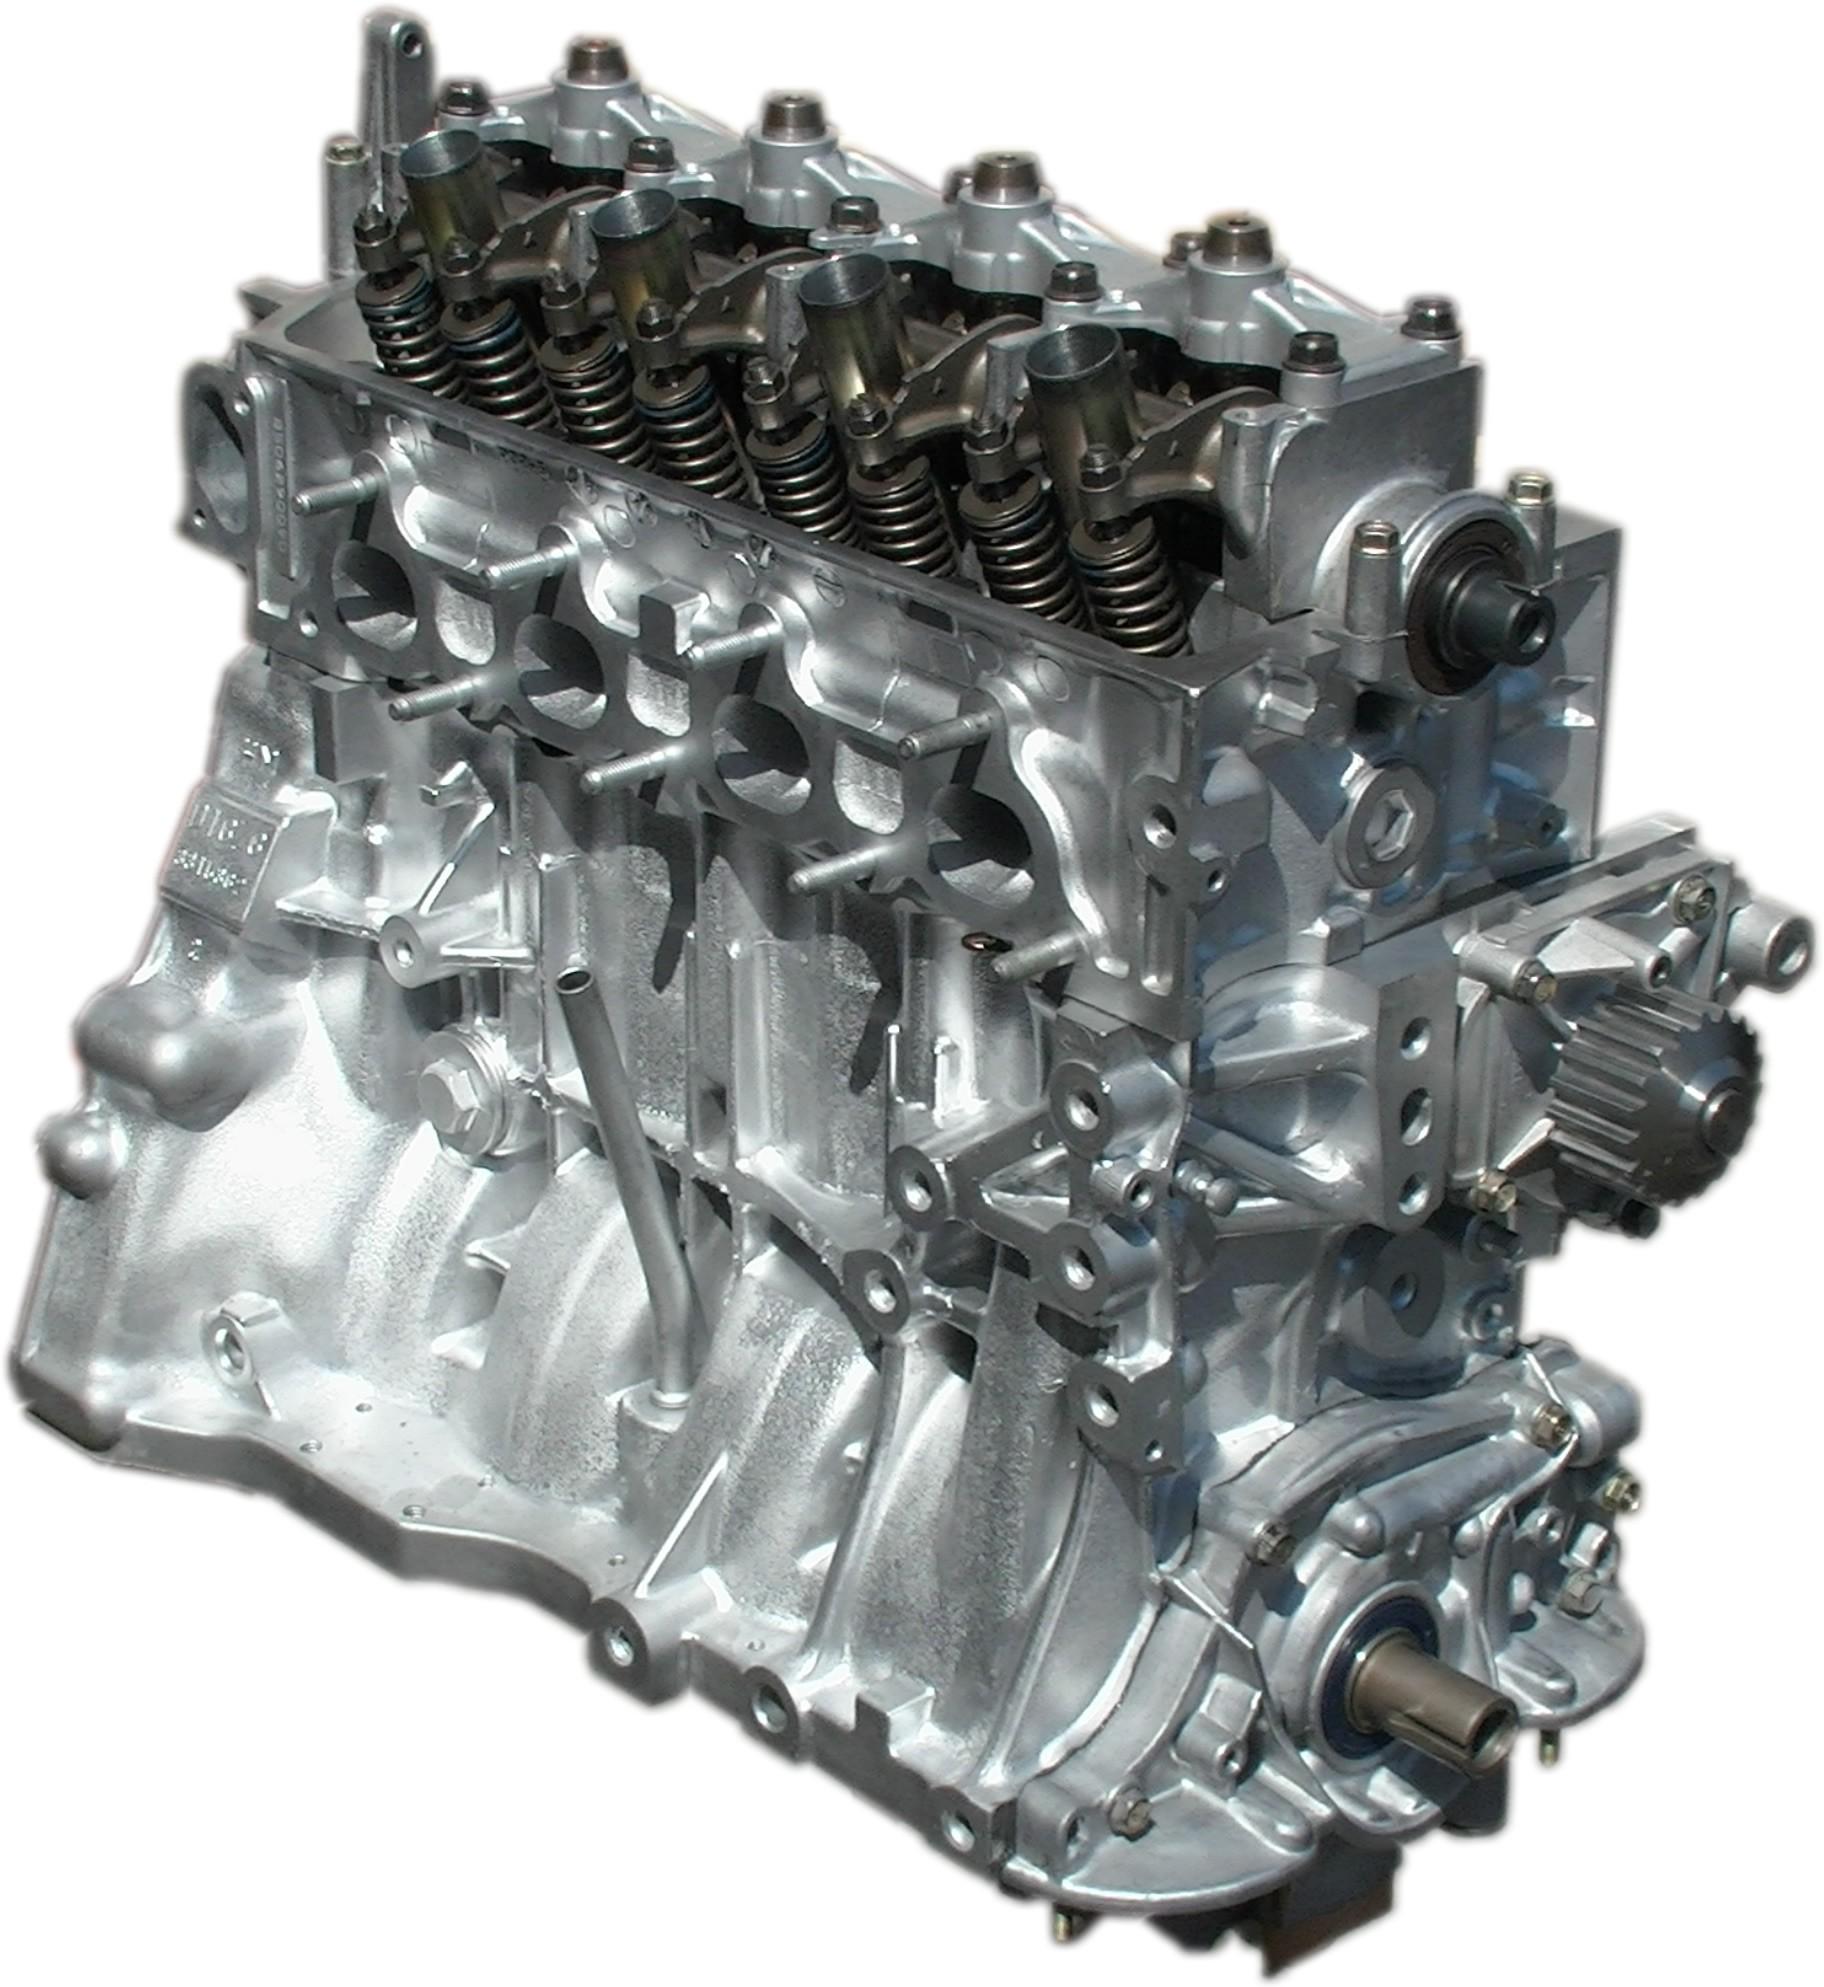 rebuilt 92 95 honda civic 1 6l 4cyl vtec sohc d16z6 engine 171 kar king auto